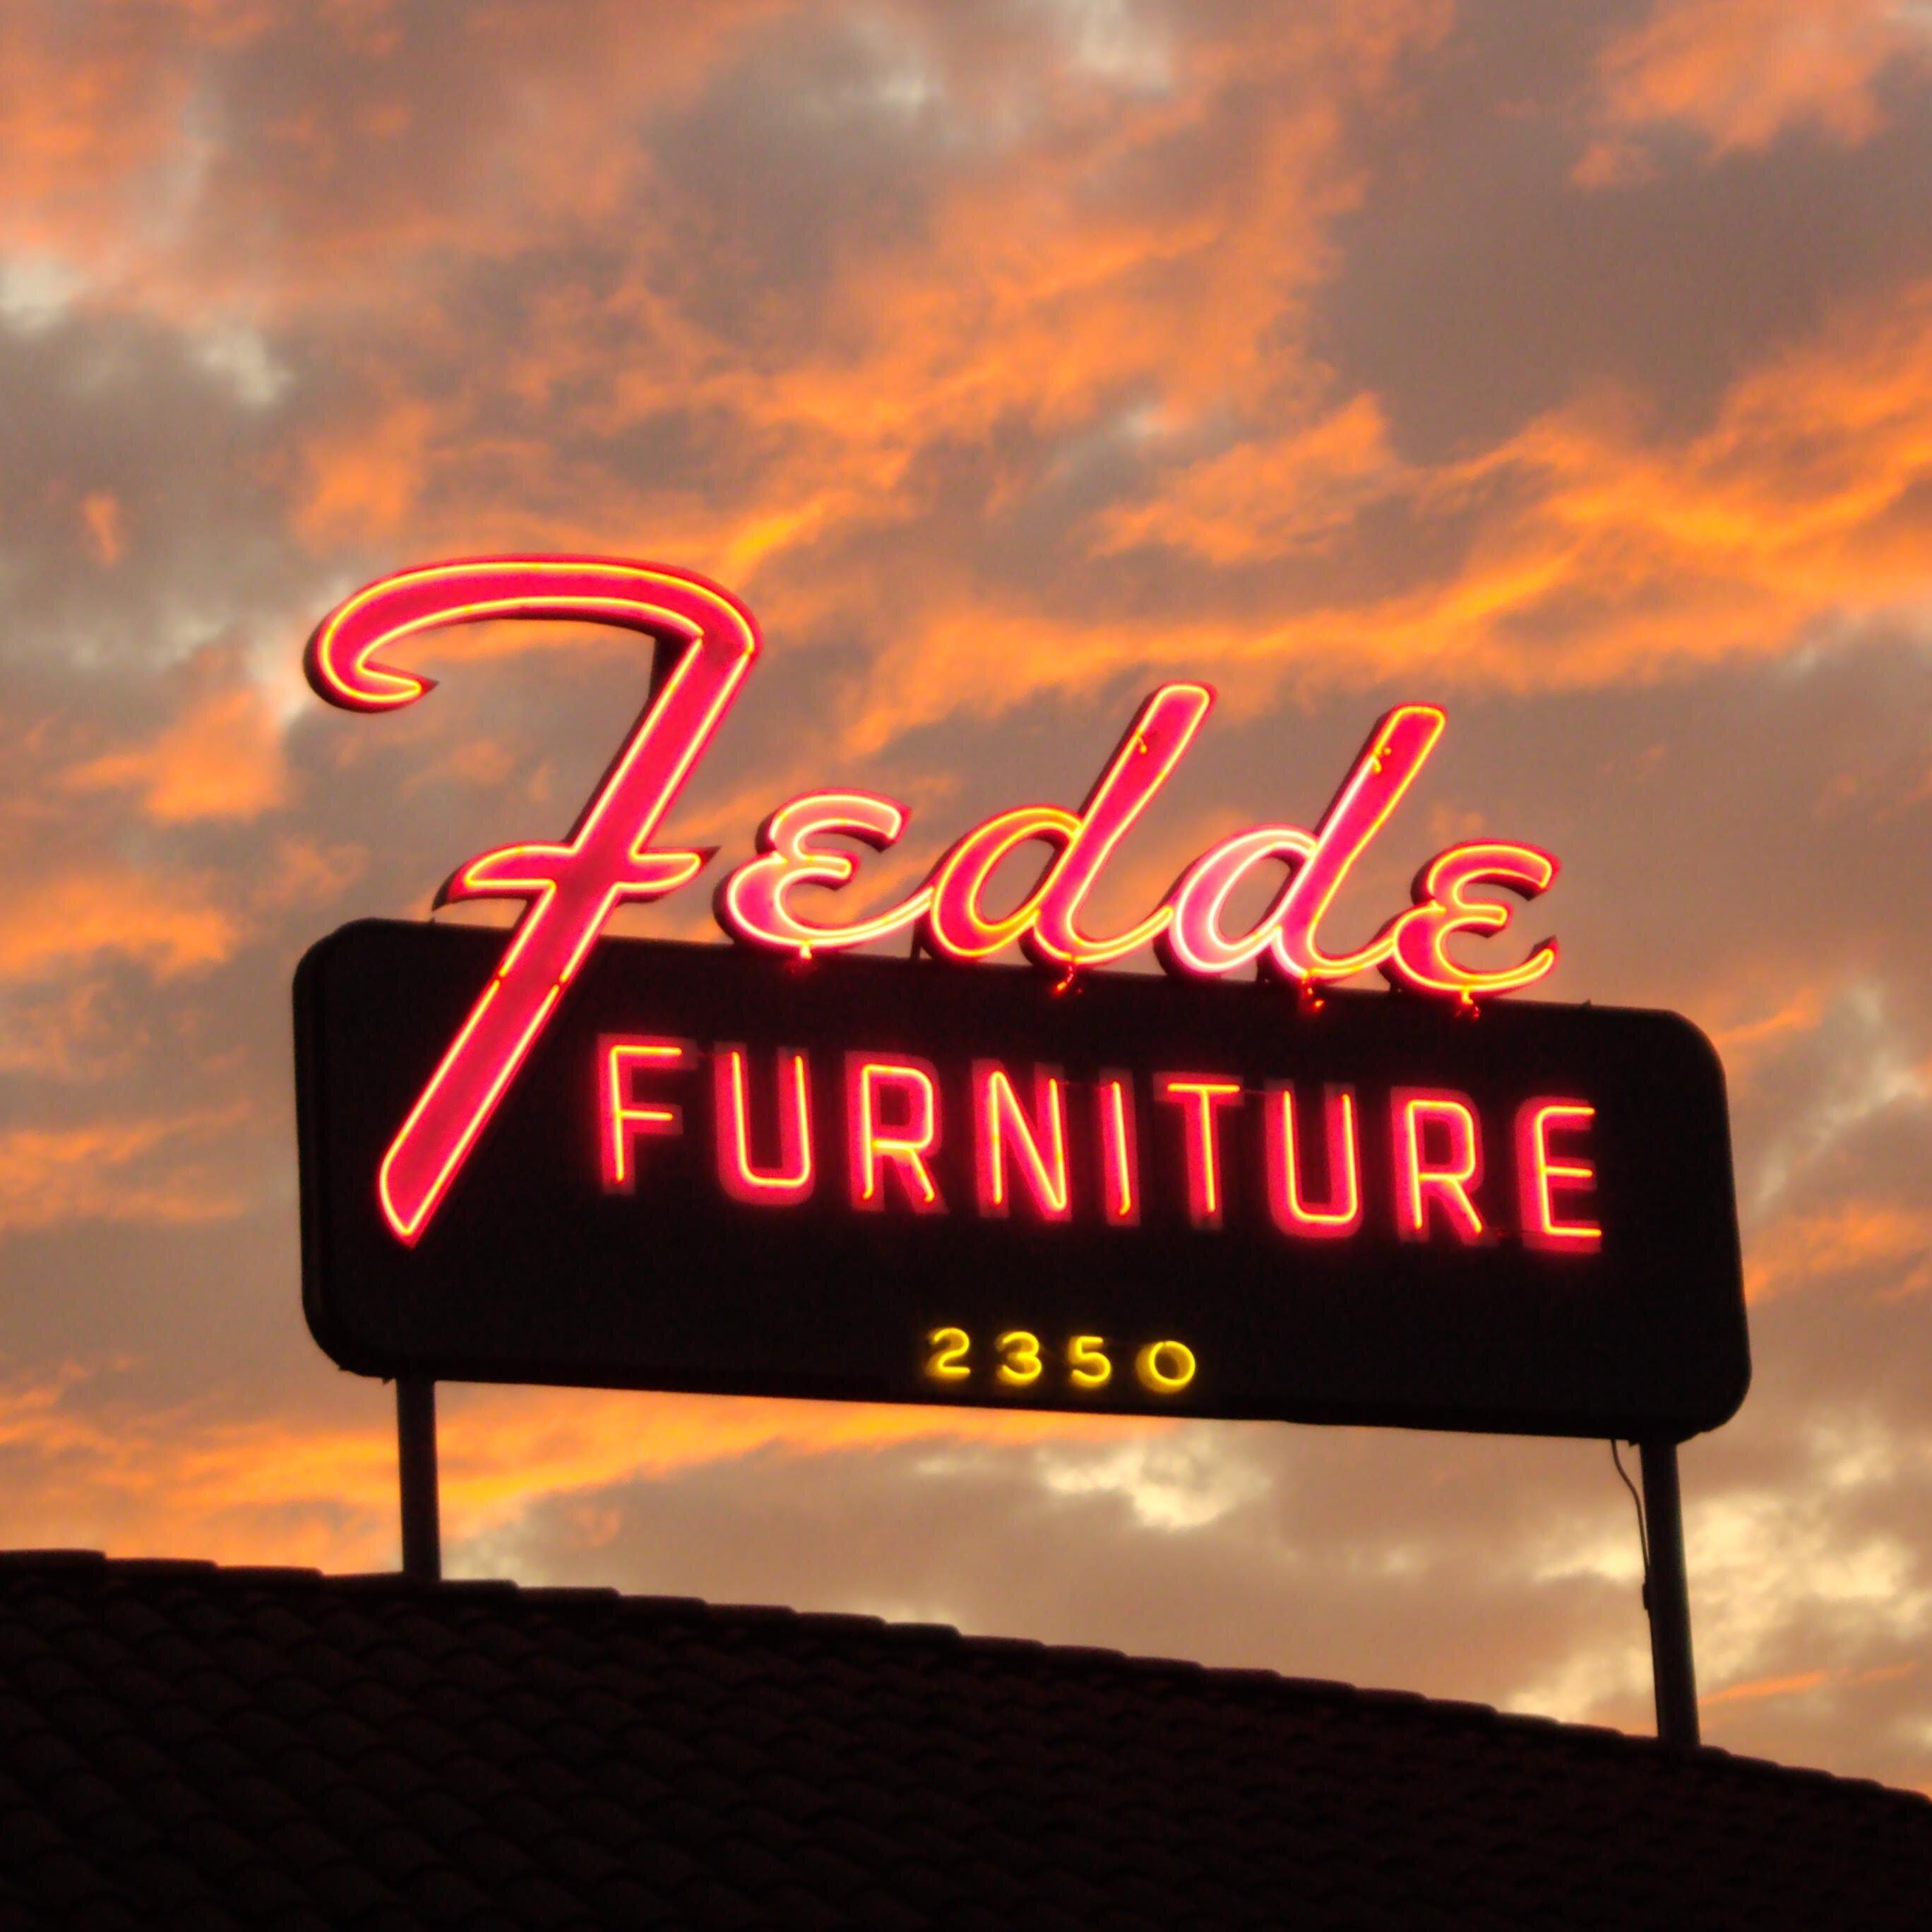 Delightful Fedde Furniture